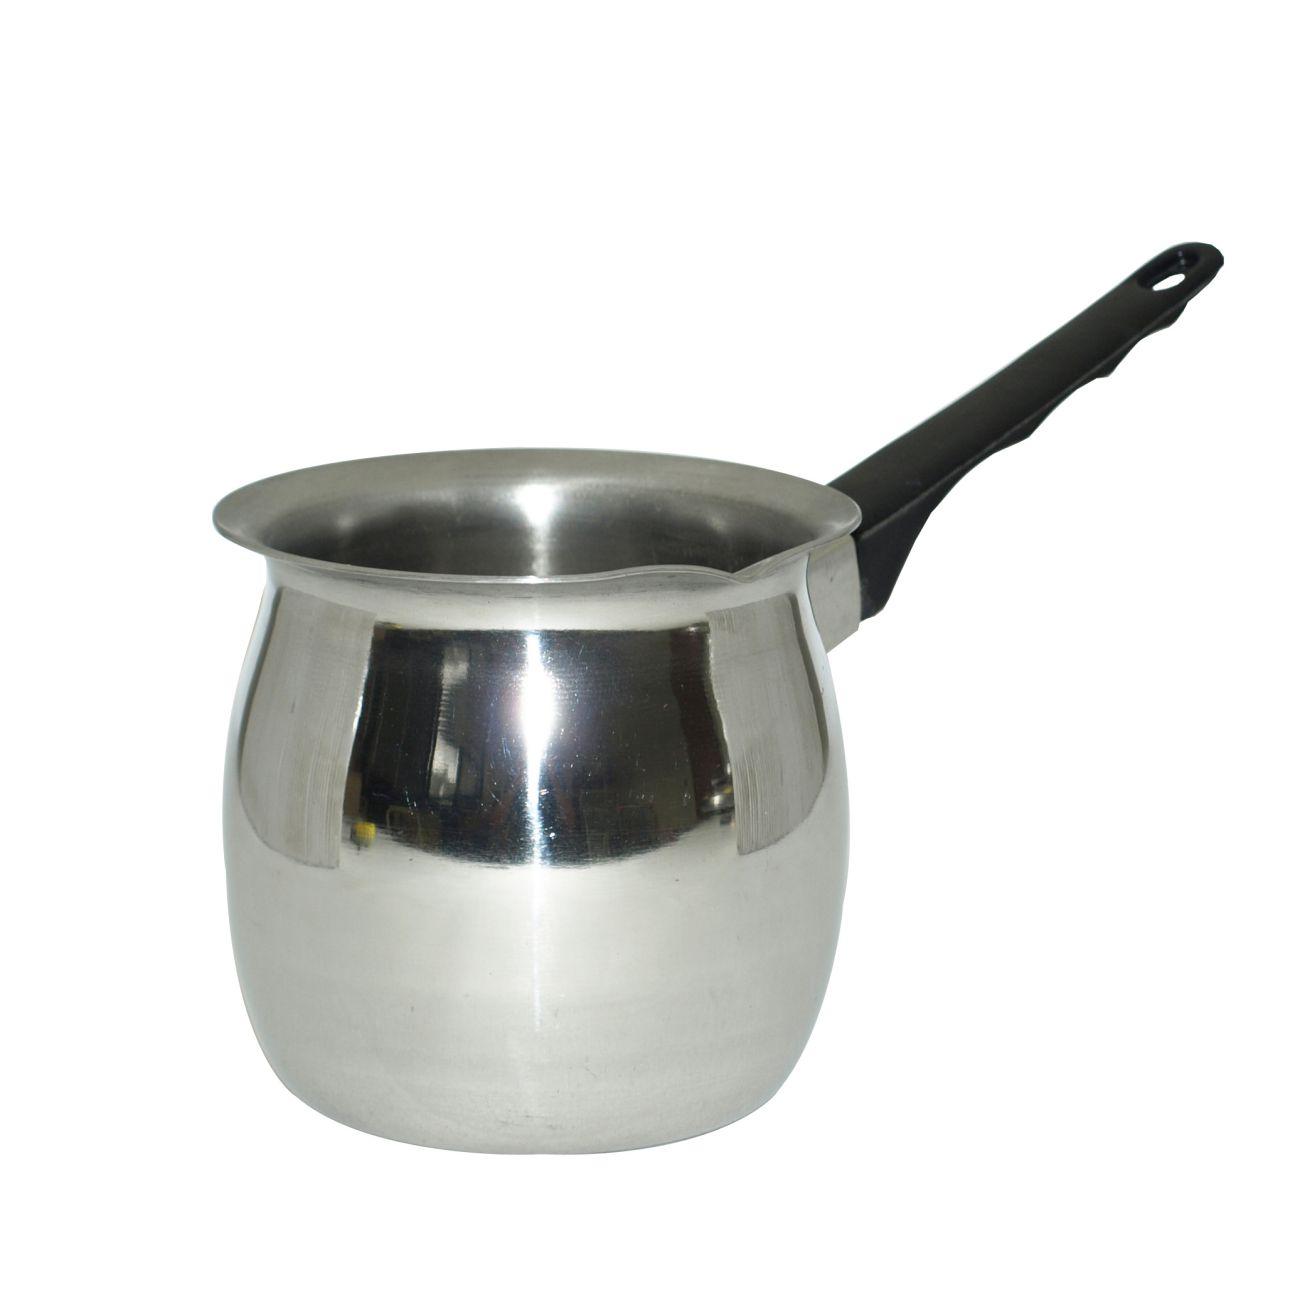 Džezva inox, 24 OZ/700 ml